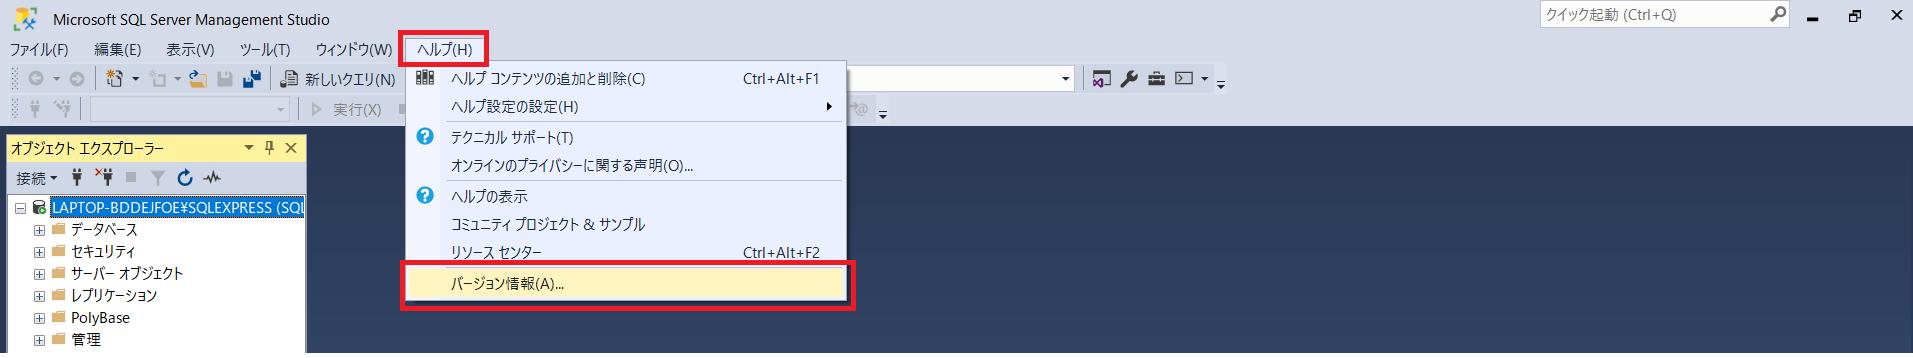 SQL Server Management Studioでヘルプを選択